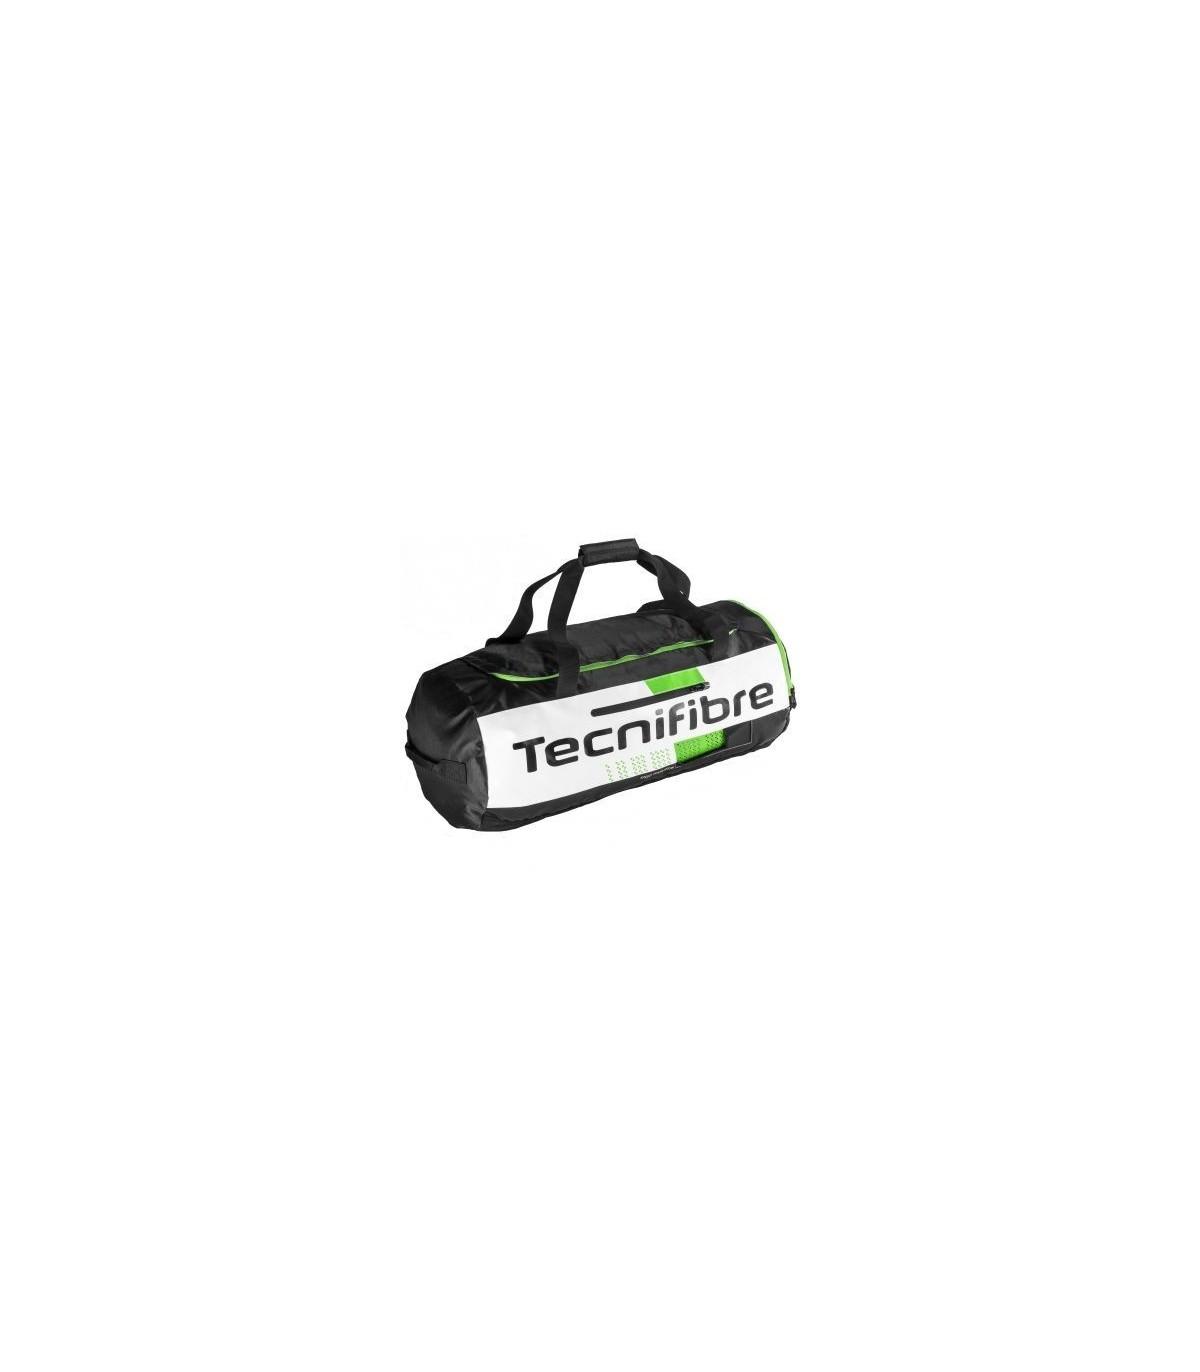 Tecnifibre Sac de sport Squash Green Training Bag owsSlkF